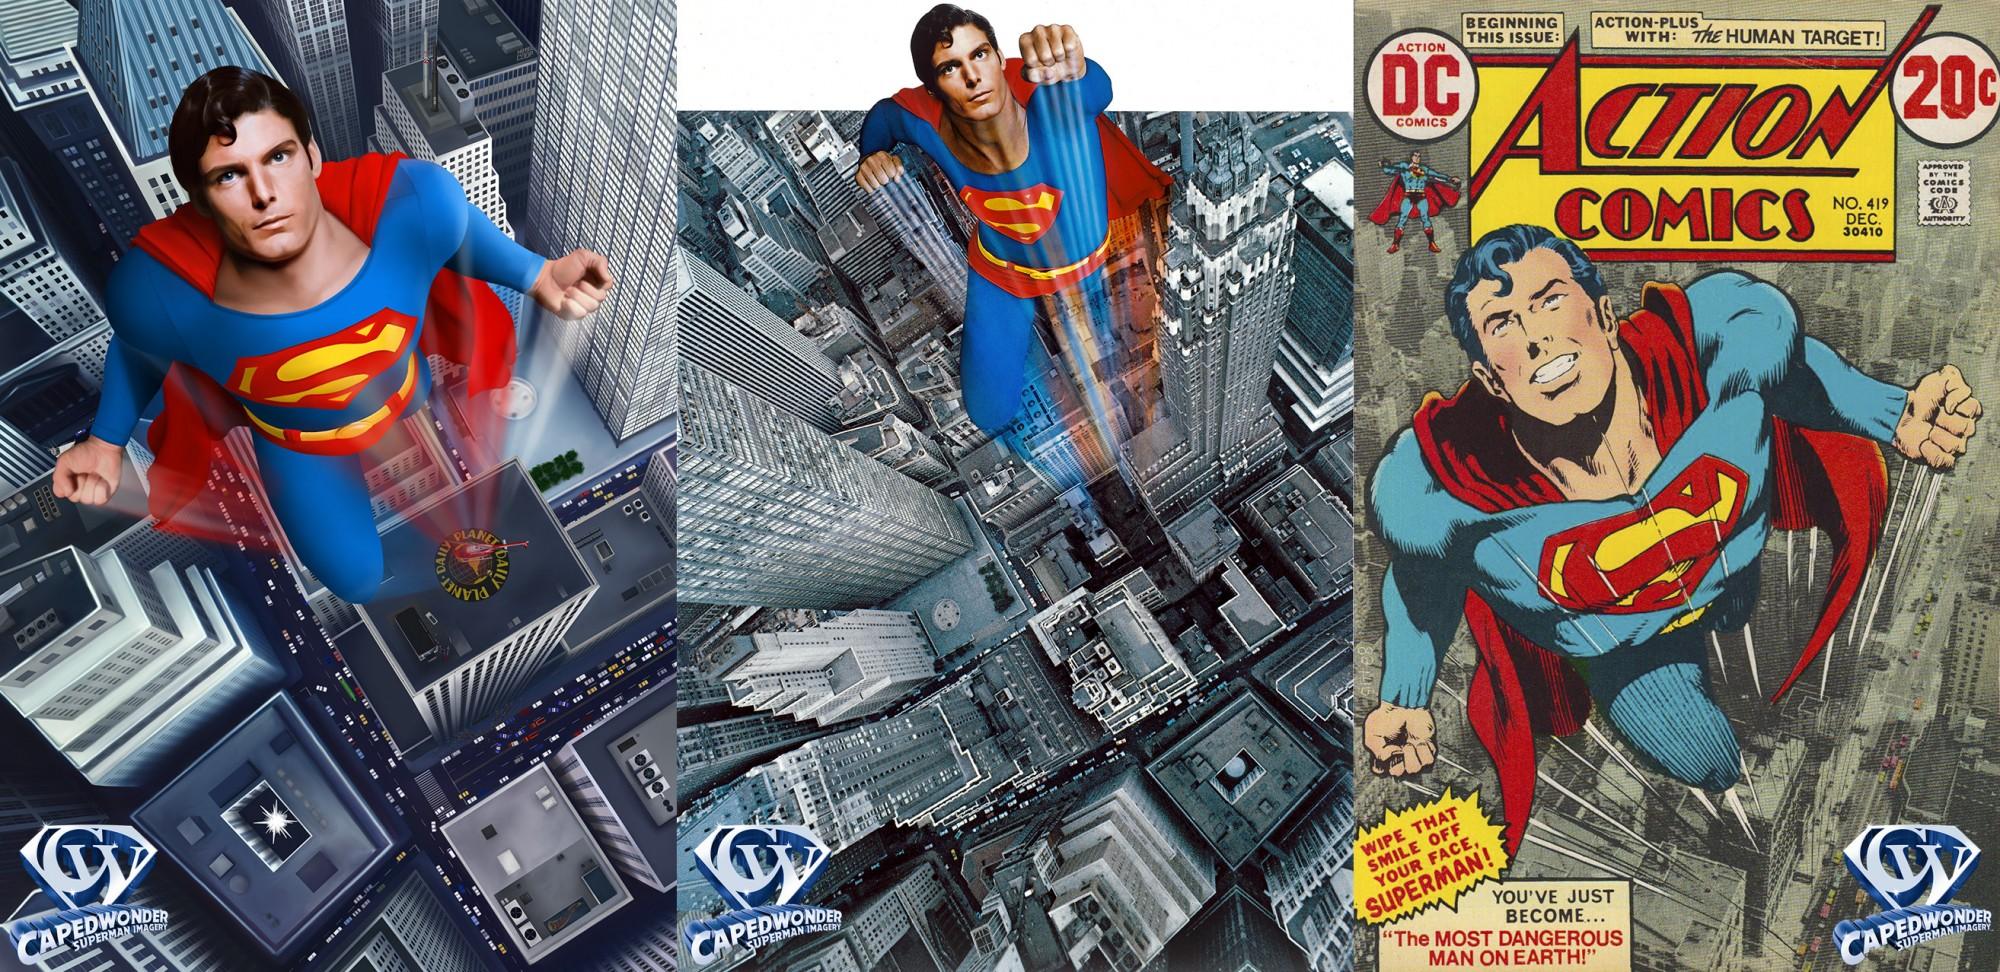 Connor McNamara's artwork (left), Superman-The Movie international poster artwork (center) and Superman #419 (right).